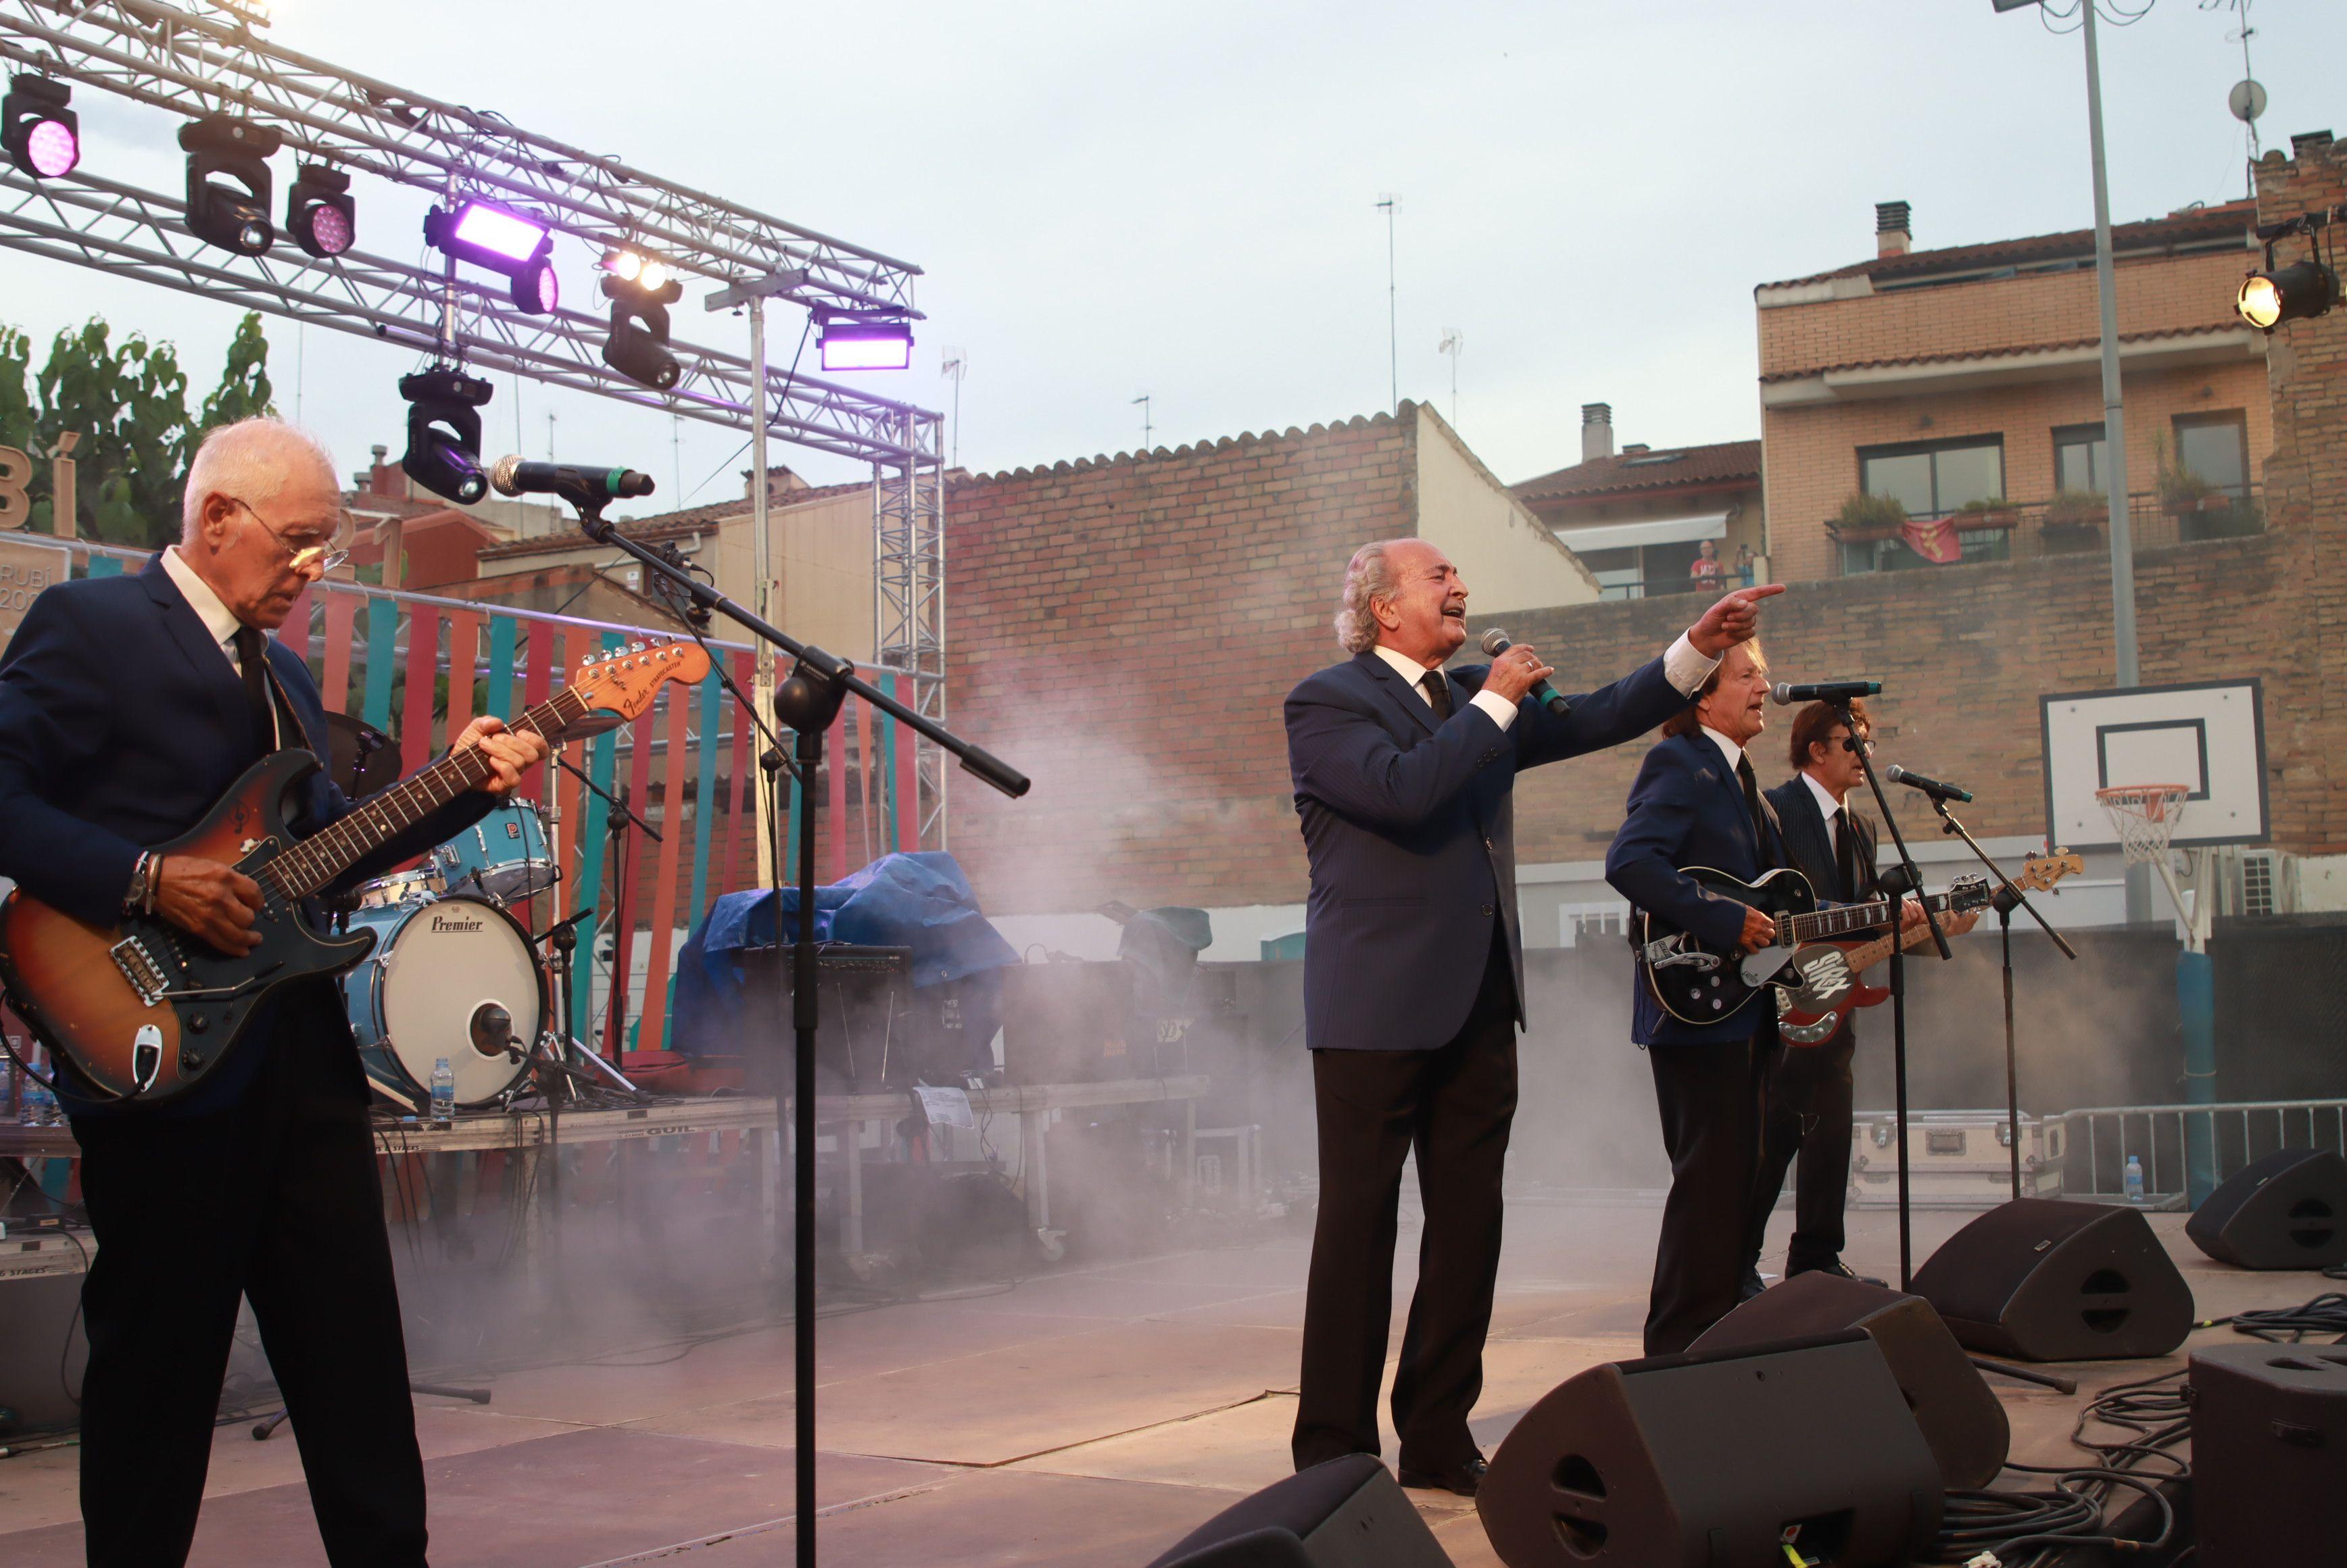 Concert de Los Sirex per Festa Major a Rubí. FOTO: Josep Llamas